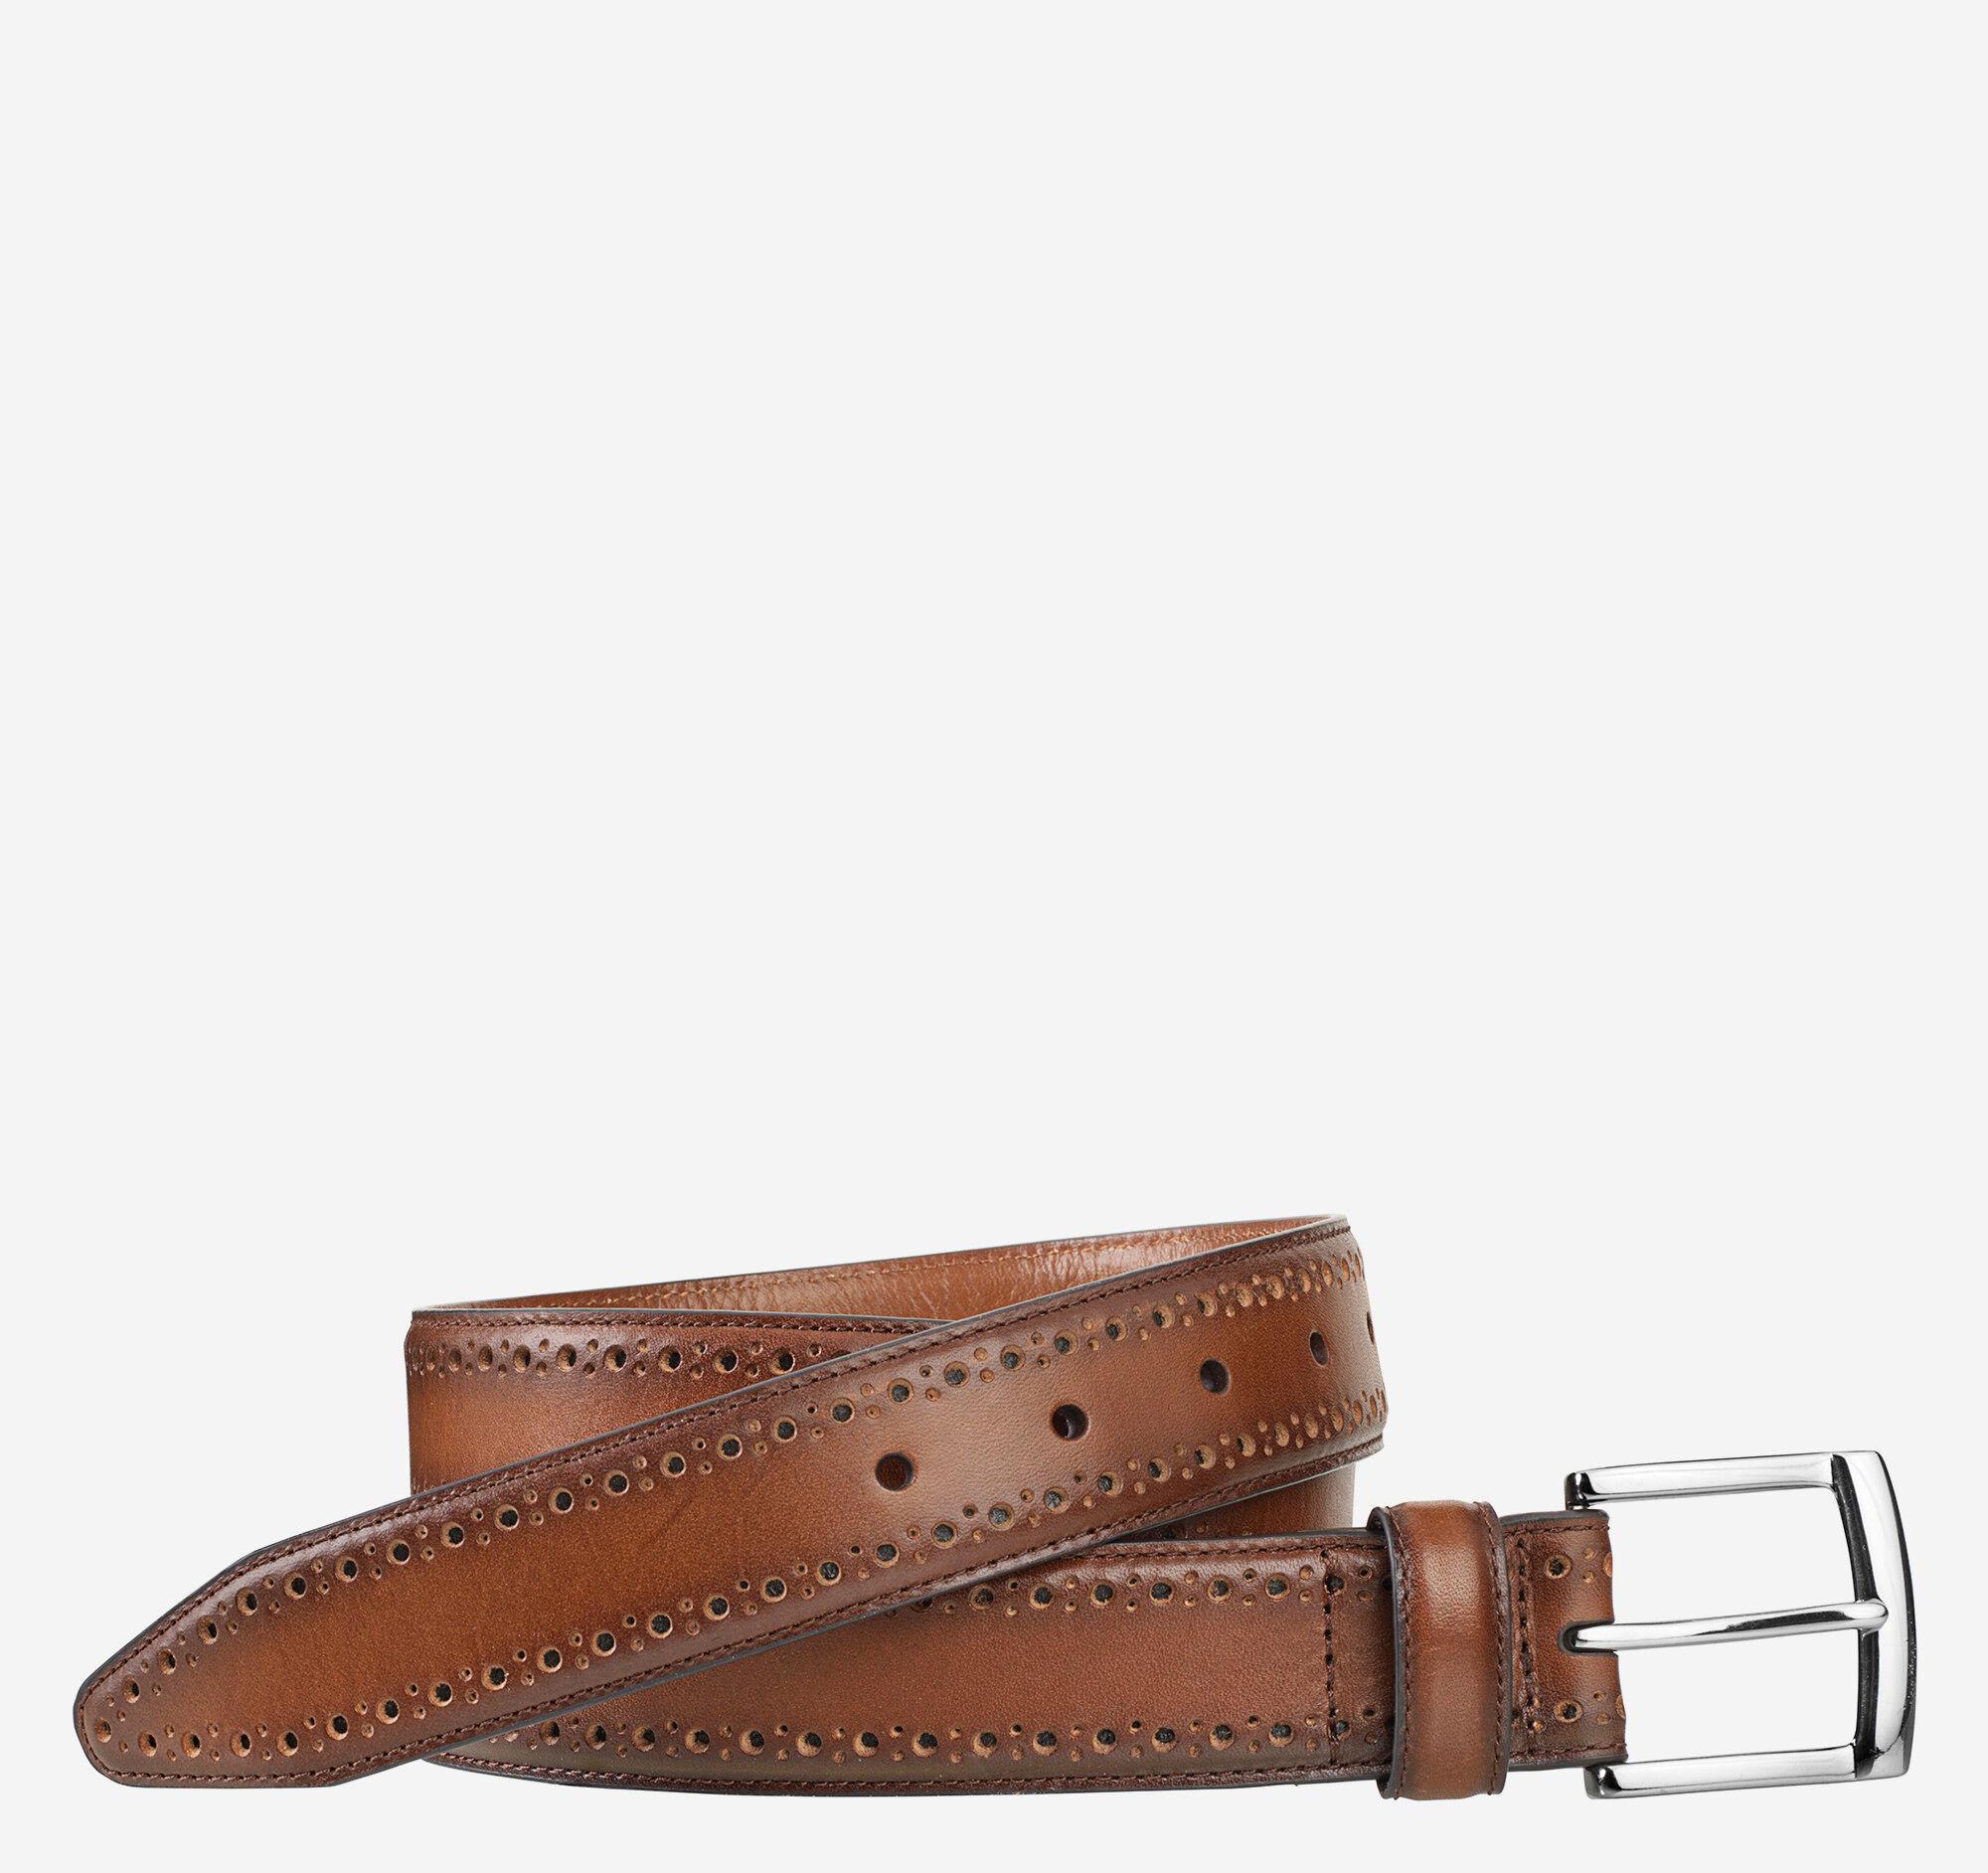 Johnston & Murphy Men's Perfed-Edge Belt - Tan - Size 32